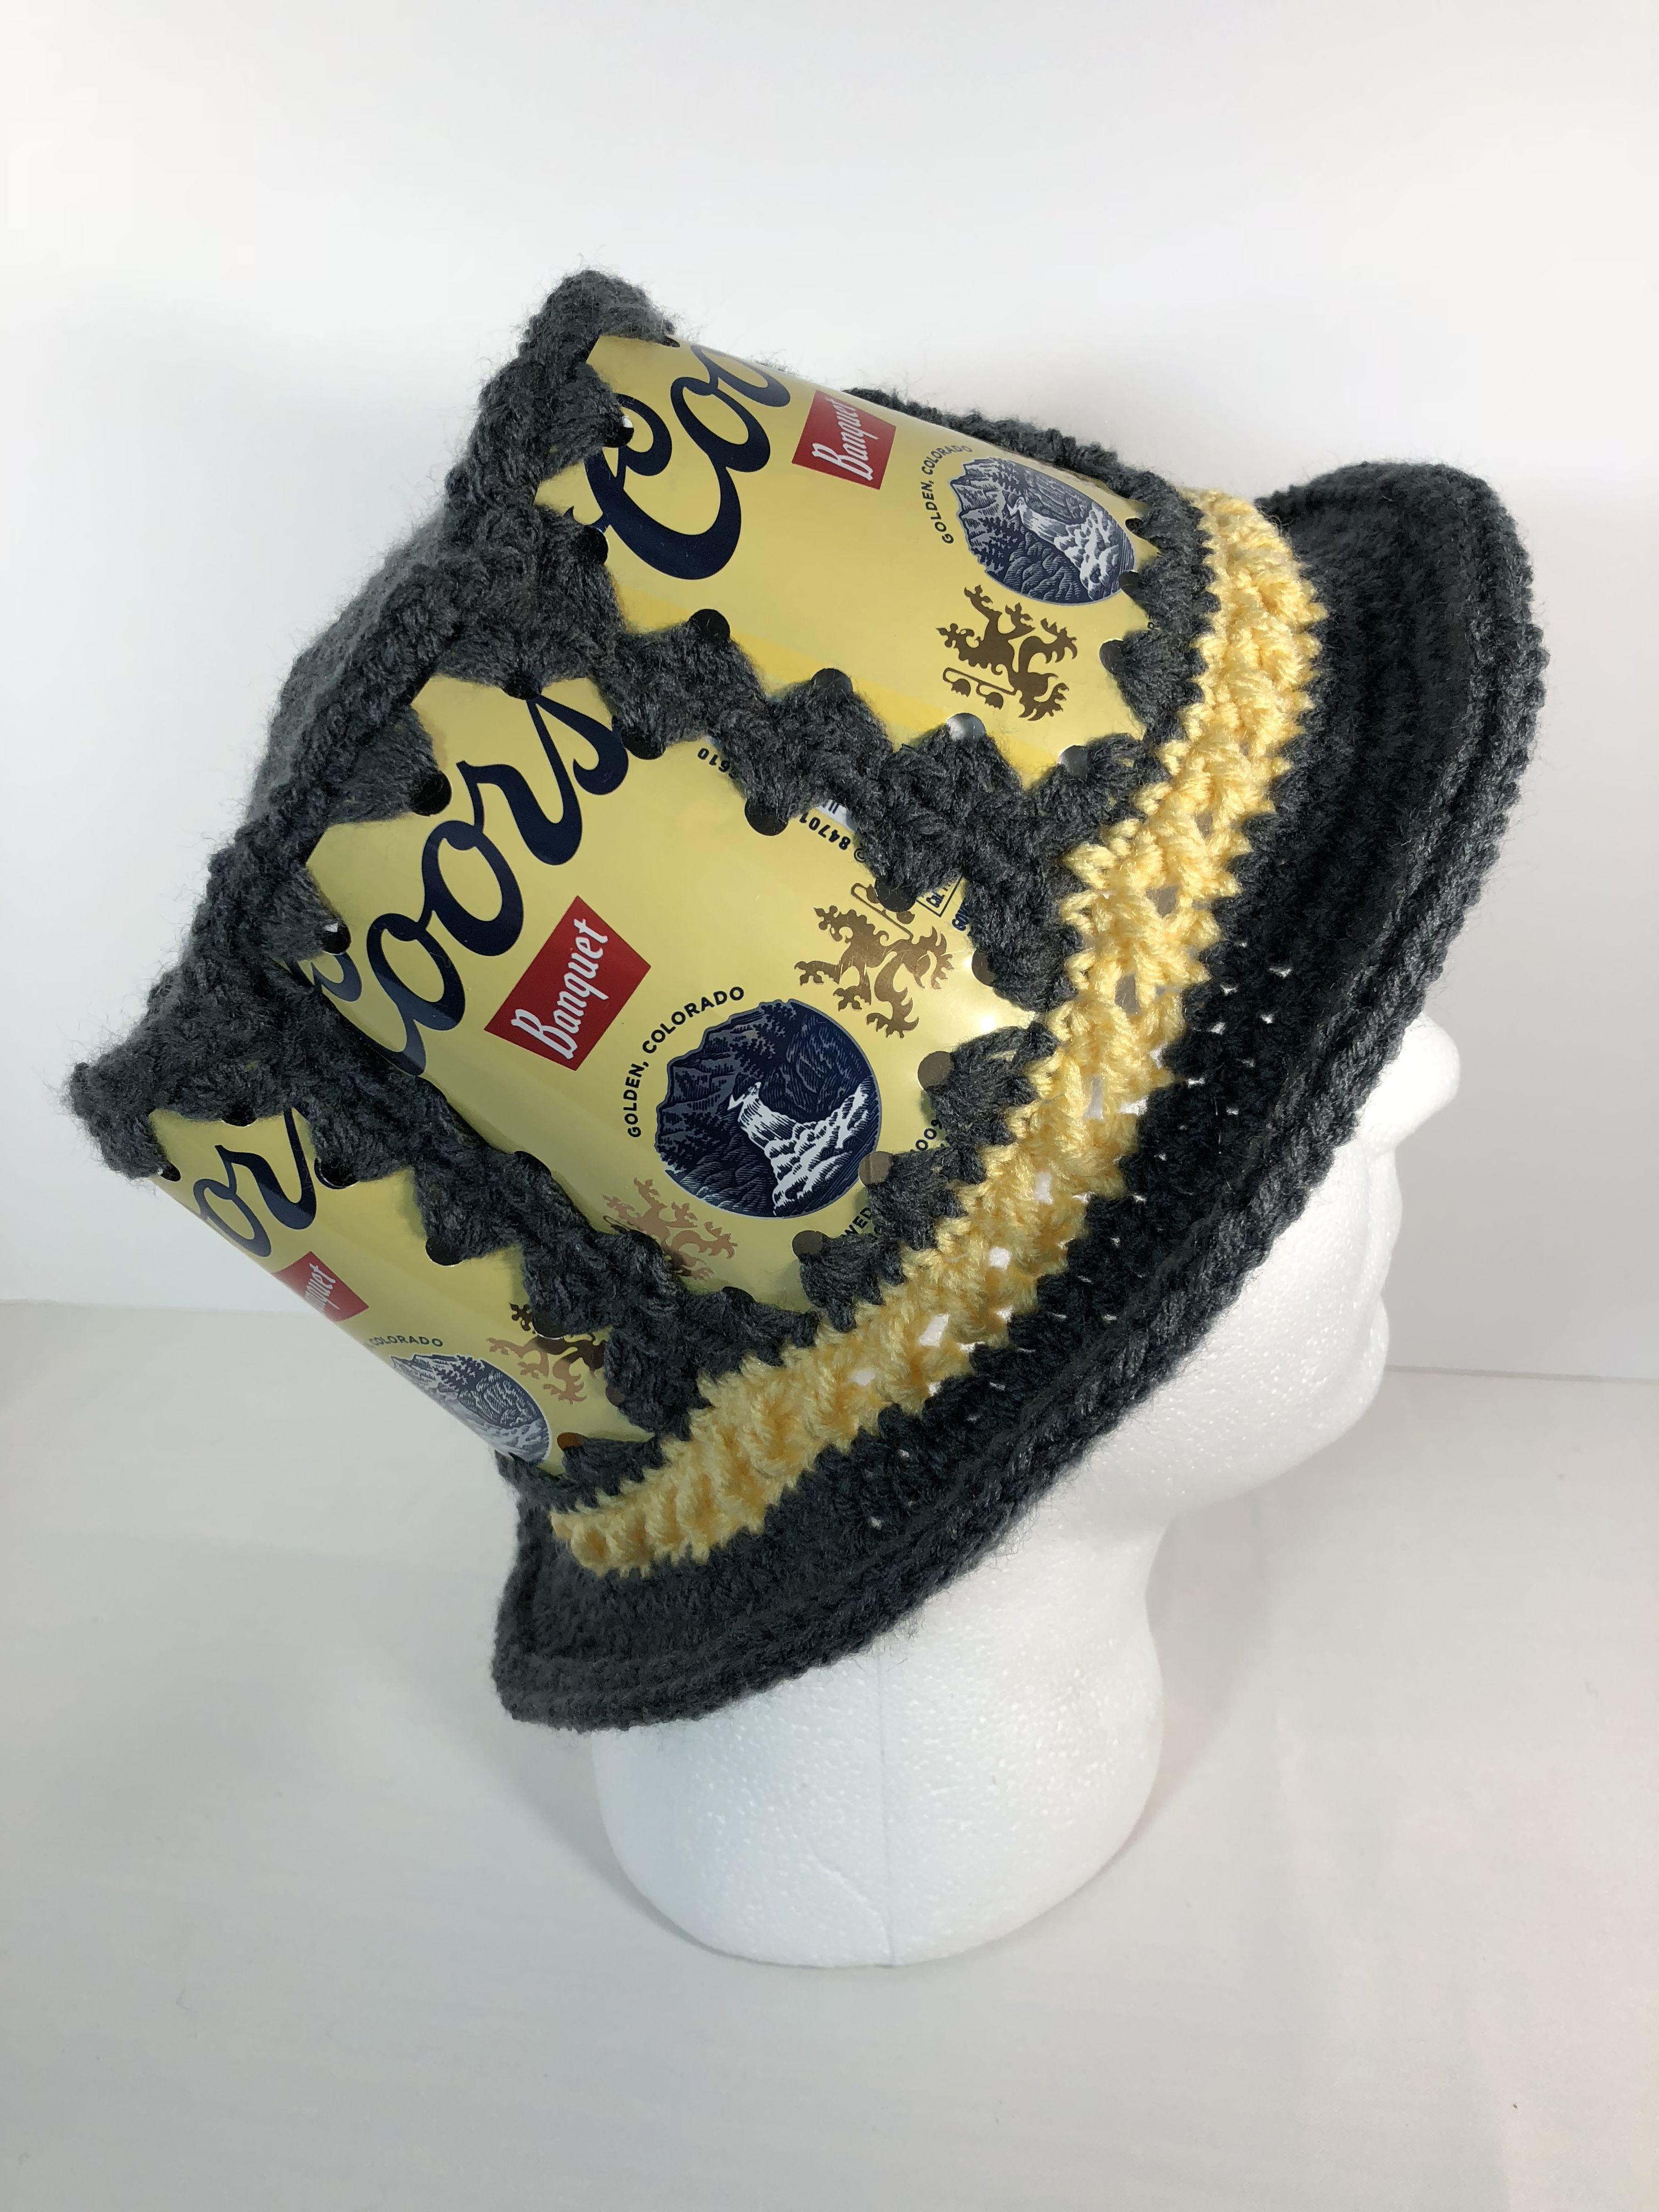 241b4bb65ea31 Coor s beer can hat